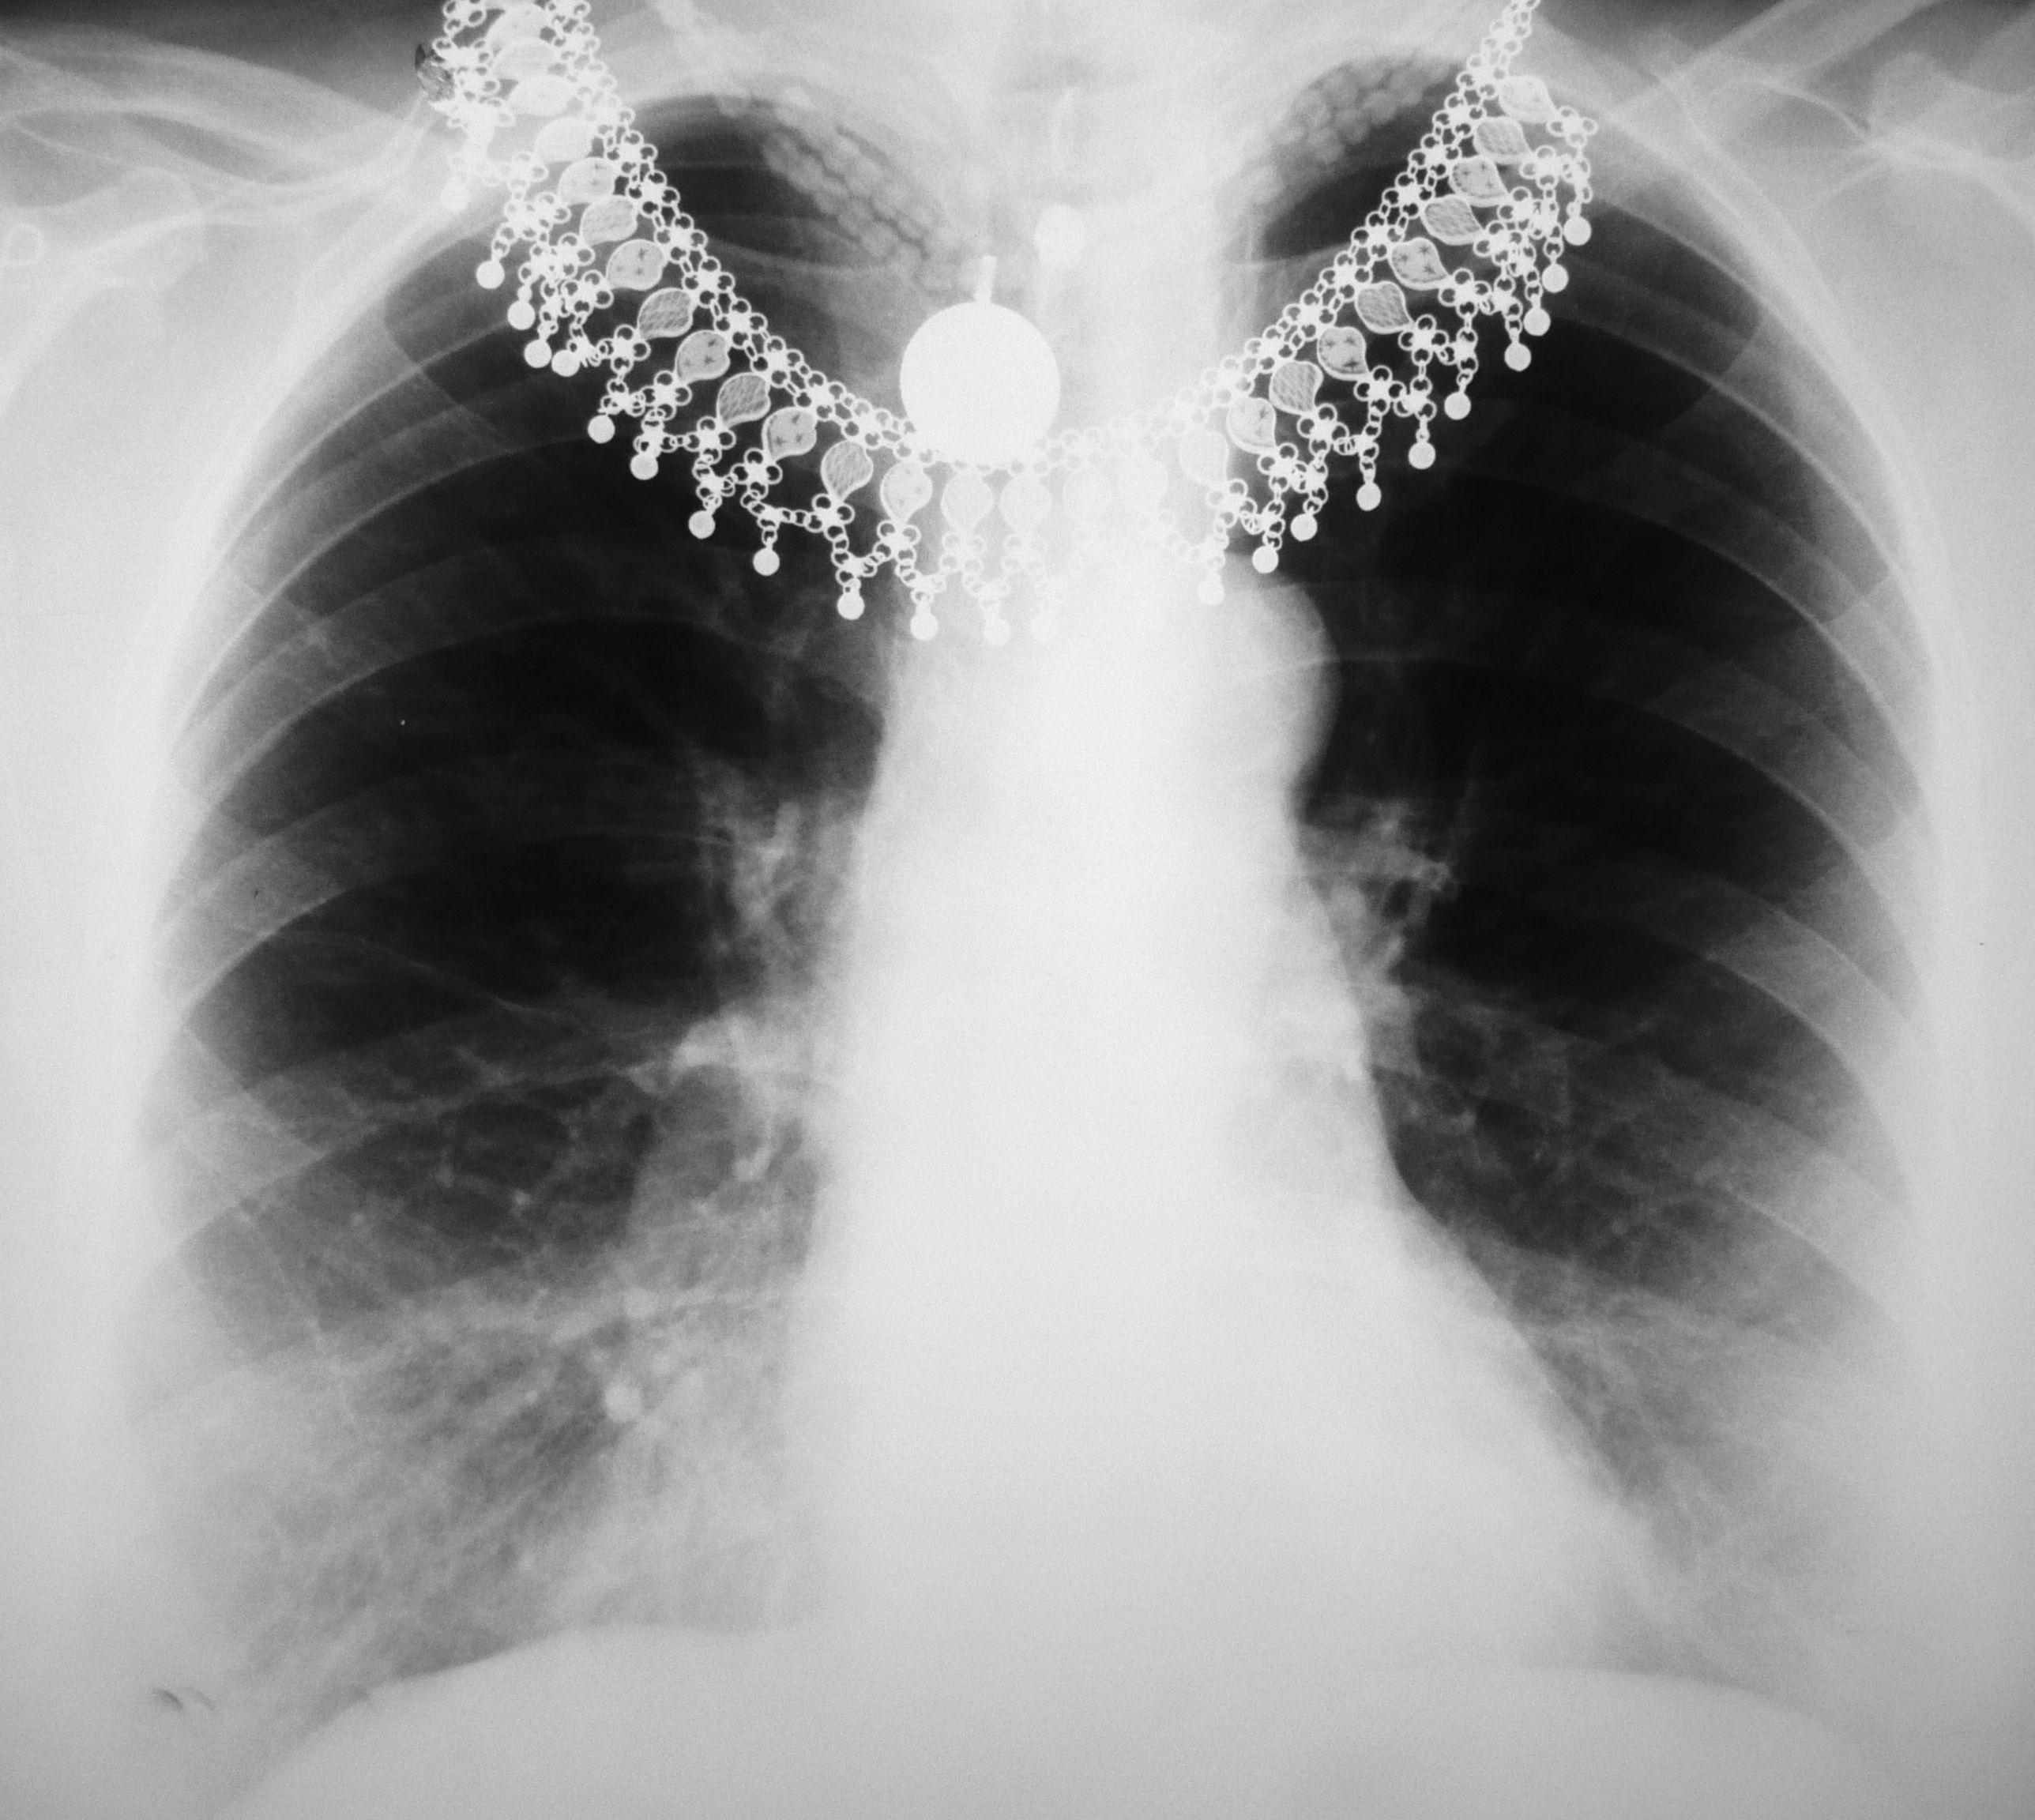 Emergency Chest X Ray